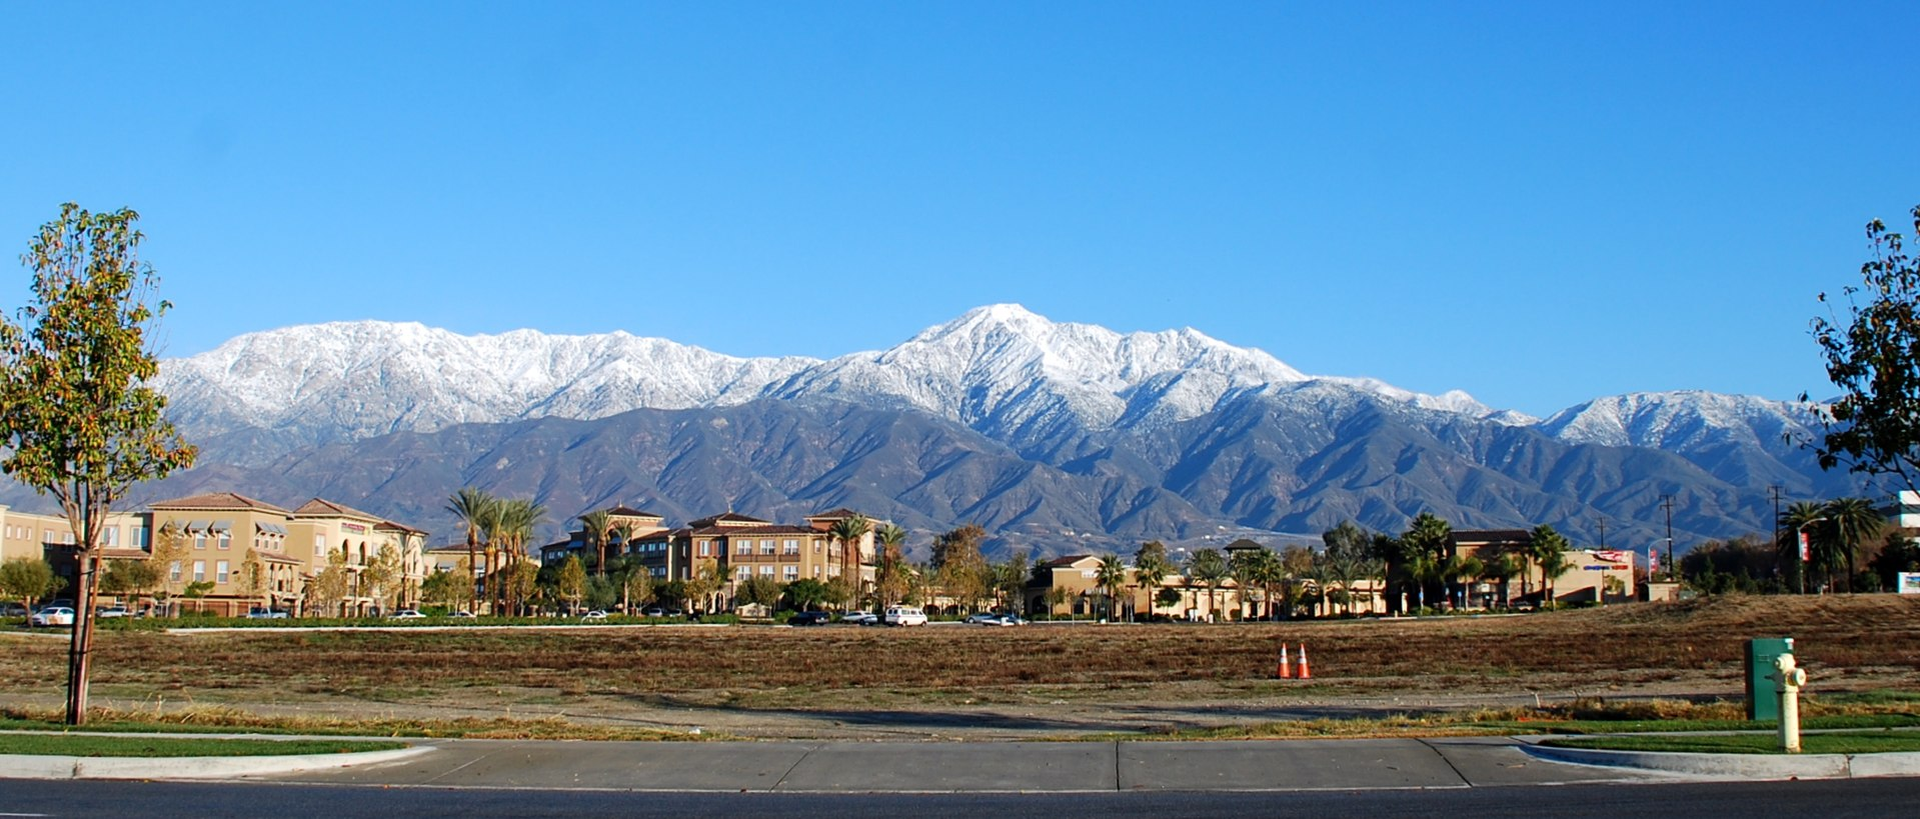 Rancho Cucamonga California Wikipedia